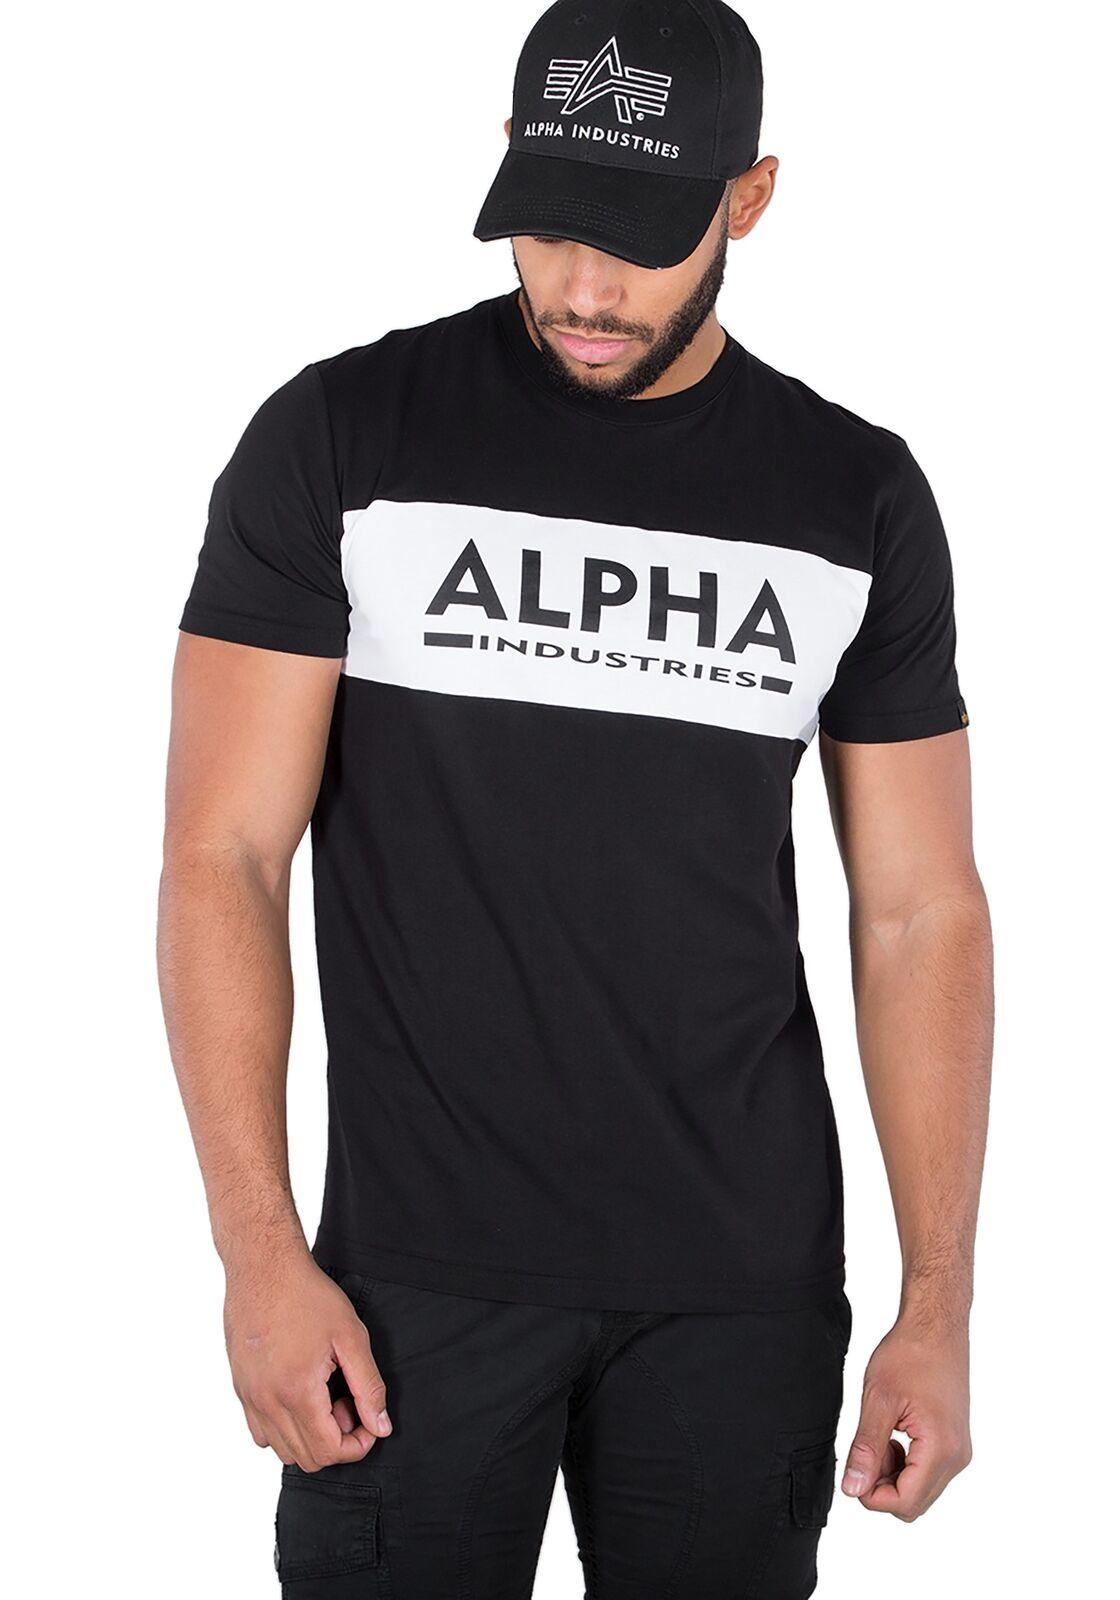 klasyczne style sprzedawca hurtowy urok kosztów Alpha Industries Herren Men T Shirt Inlay T Oberteil Shirt MA1 S Bis 3XL  NEU Colour Jersey Print T Shirt Make Your Own Tee Shirt Design Crazy T  Shirt ...